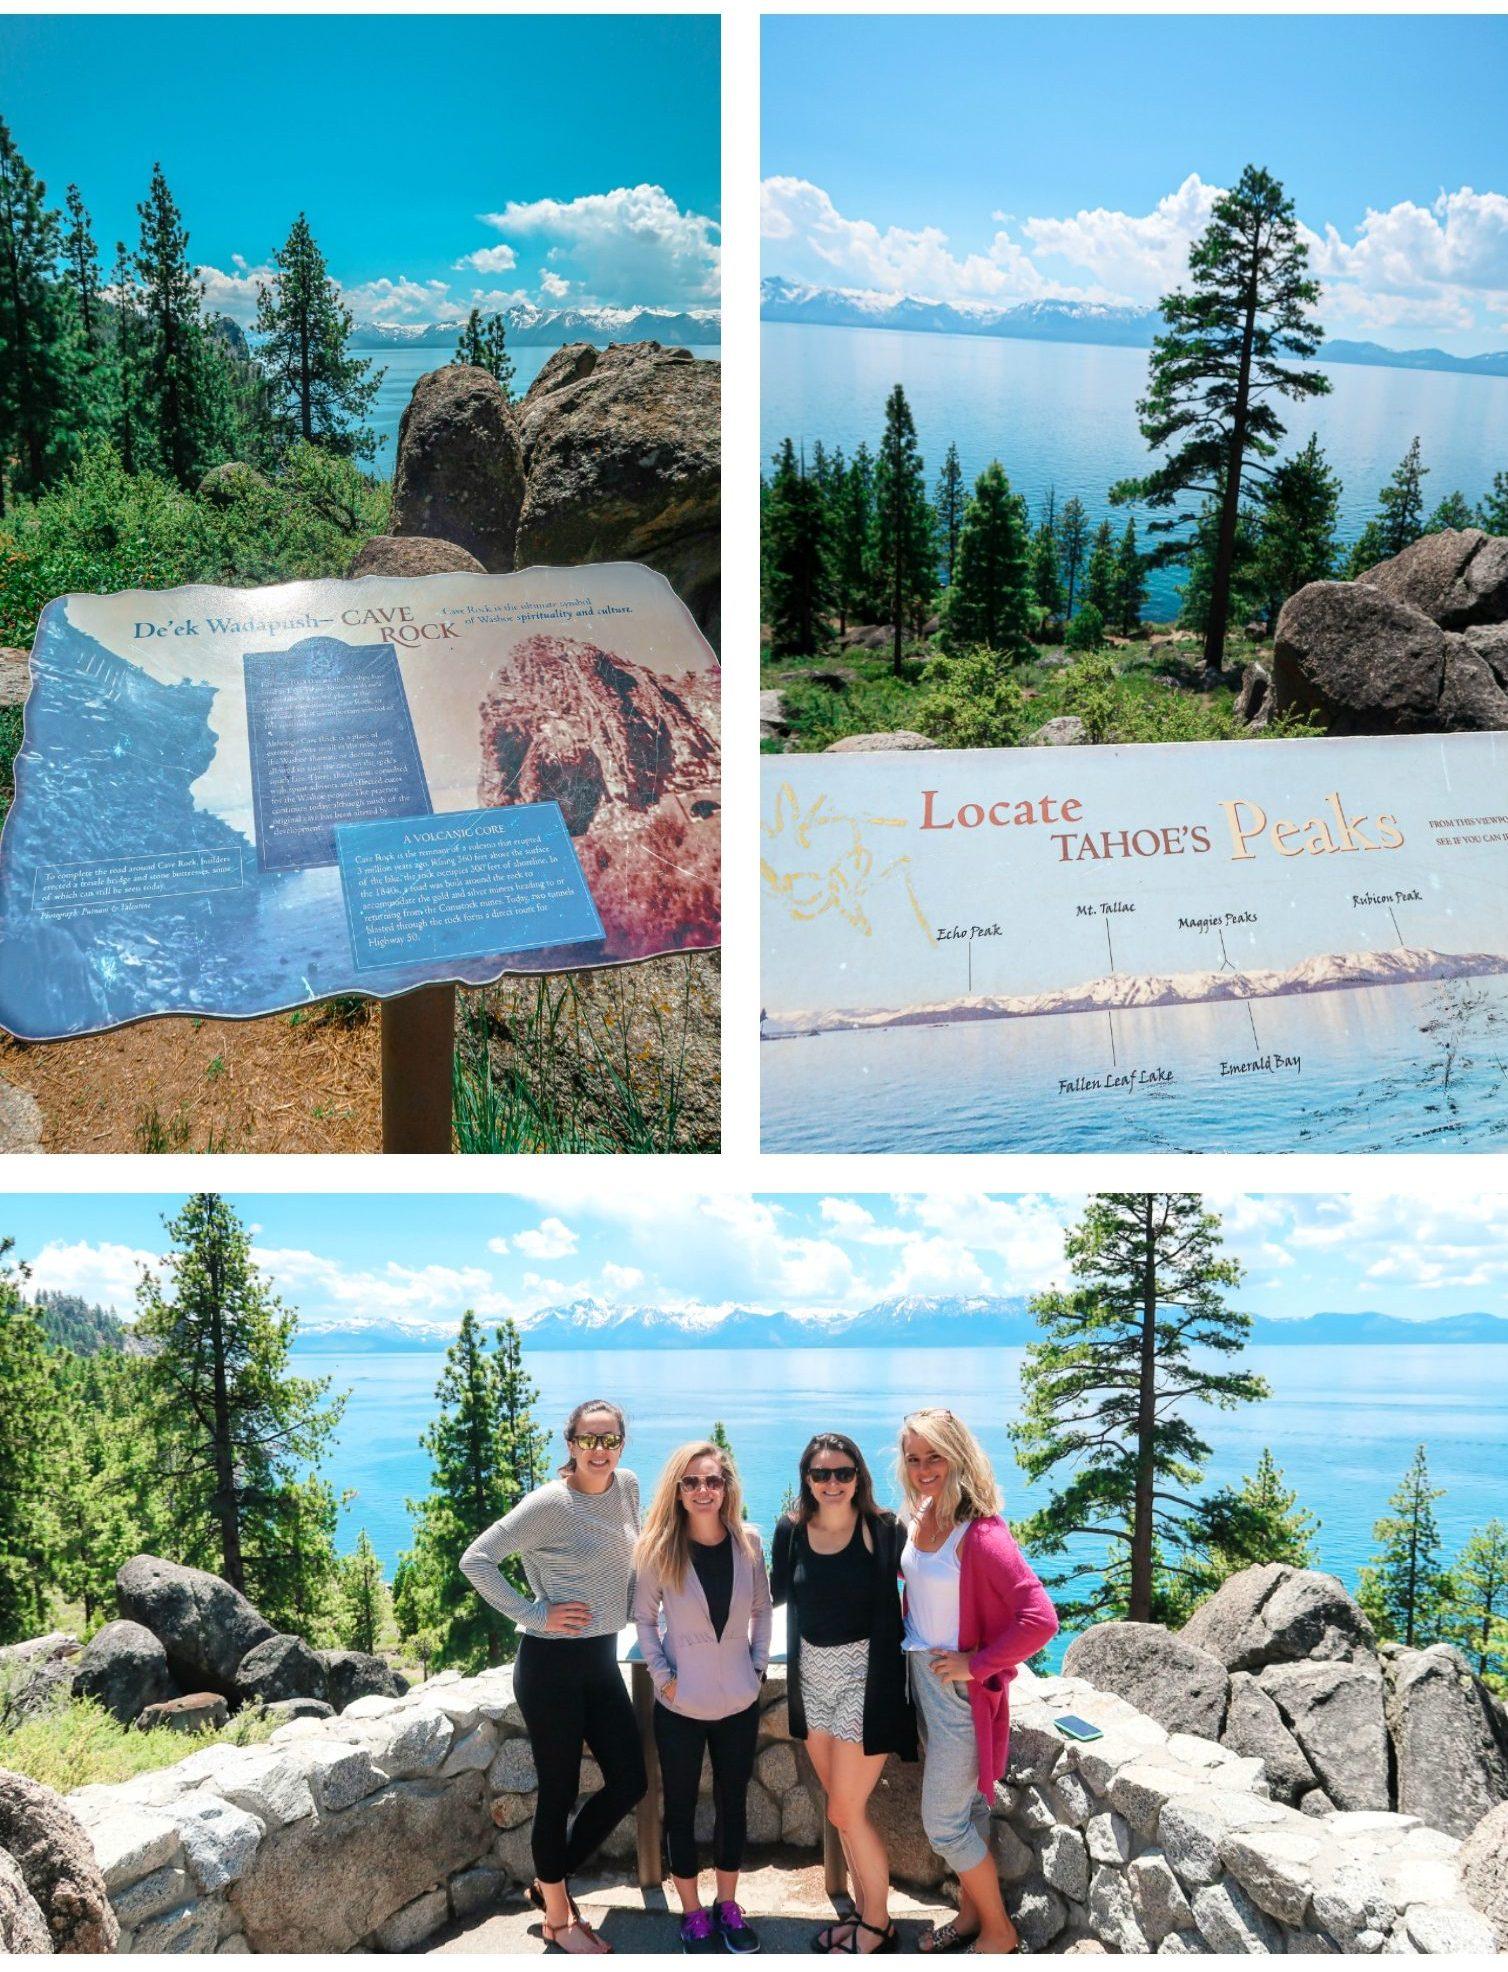 Lake Tahoe South, Travel Blog, Simply Taralynn, Travel Blogger, Traveling, Blog, Travel, Mountains, Edgewood Bistro, California, Nevada, Summer, Trips, Traveling to Tahoe, Lake Tahoe, Where to eat, drink, stay, boating, see, things to do in Lake Tahoe, summer in lake tahoe